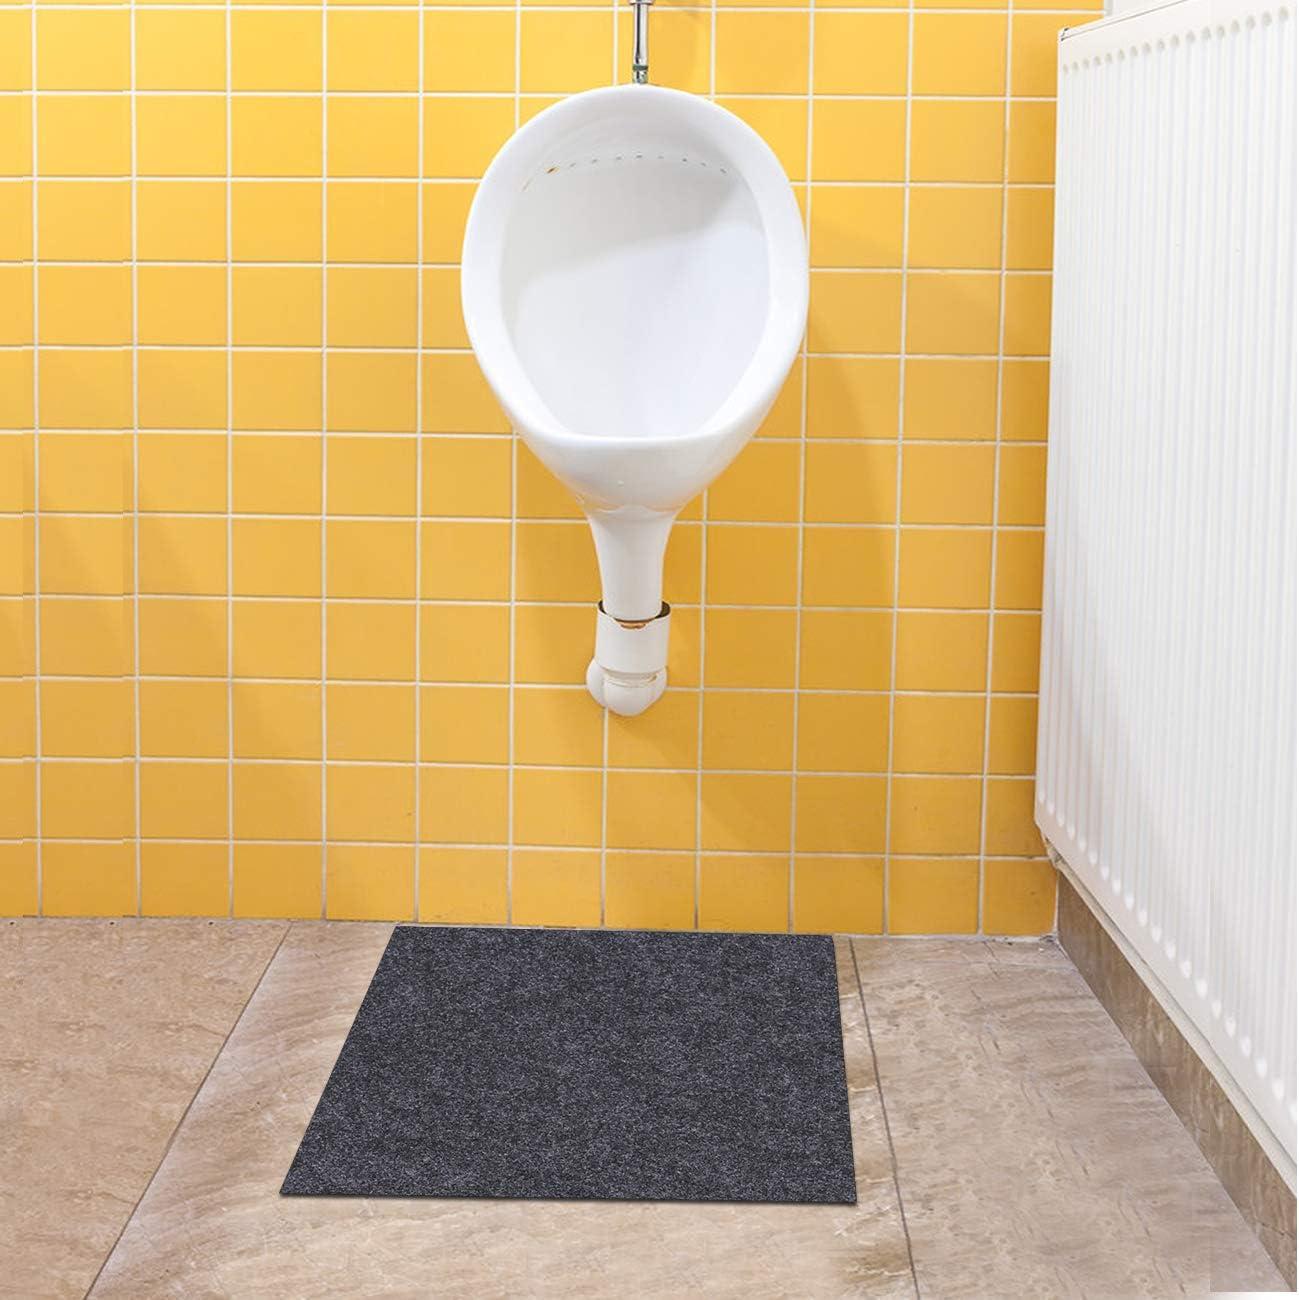 Urinal Mats Ranking TOP4 Colorado Springs Mall 4 Pack mats—Abs ,Deodorizing Floor